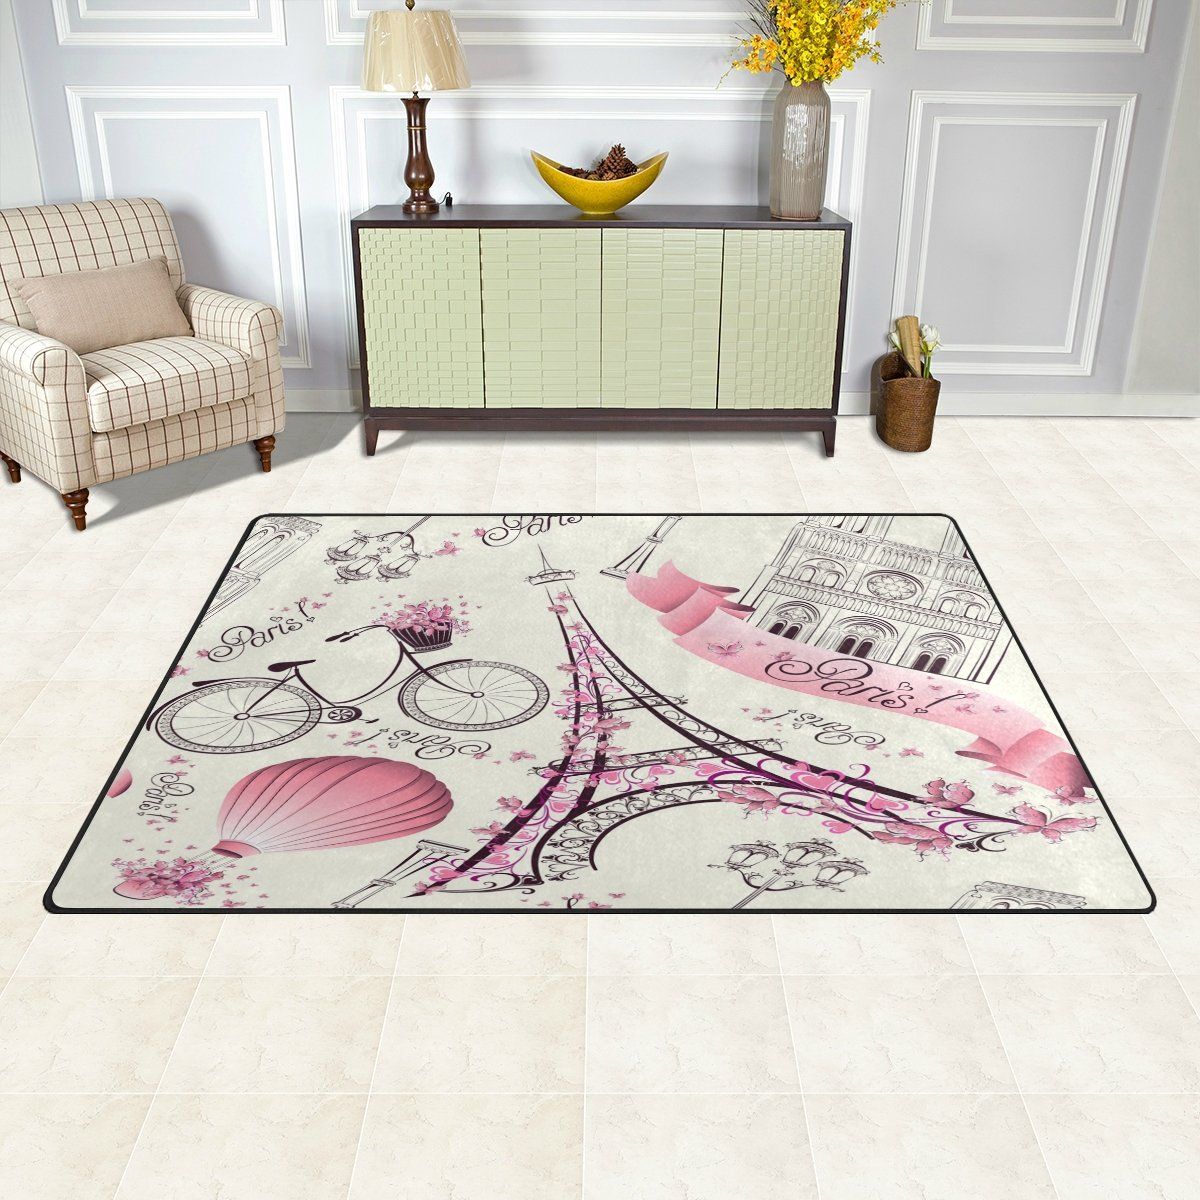 WOZO Retro Eiffel Tower Paris Bicycle Area Rug Rugs Non-Slip Floor Mat Doormats Living Room Bedroom 31 x 20 inches